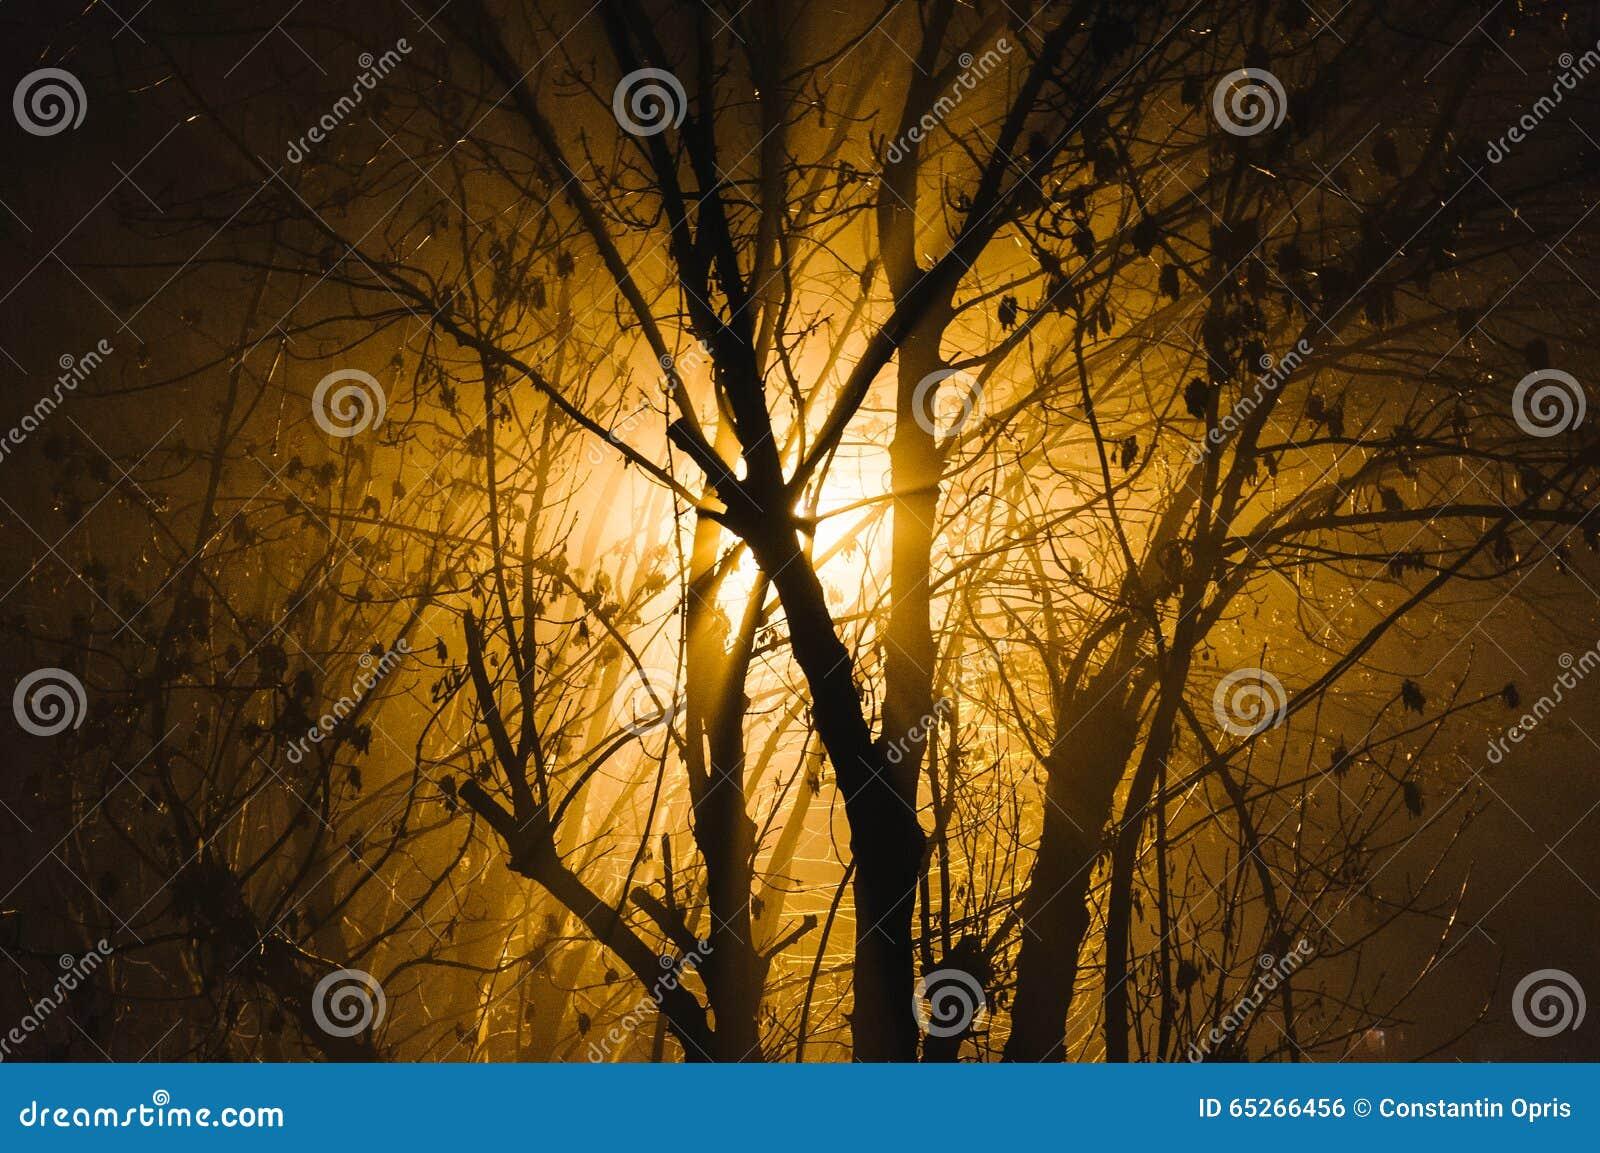 Light through bare branches